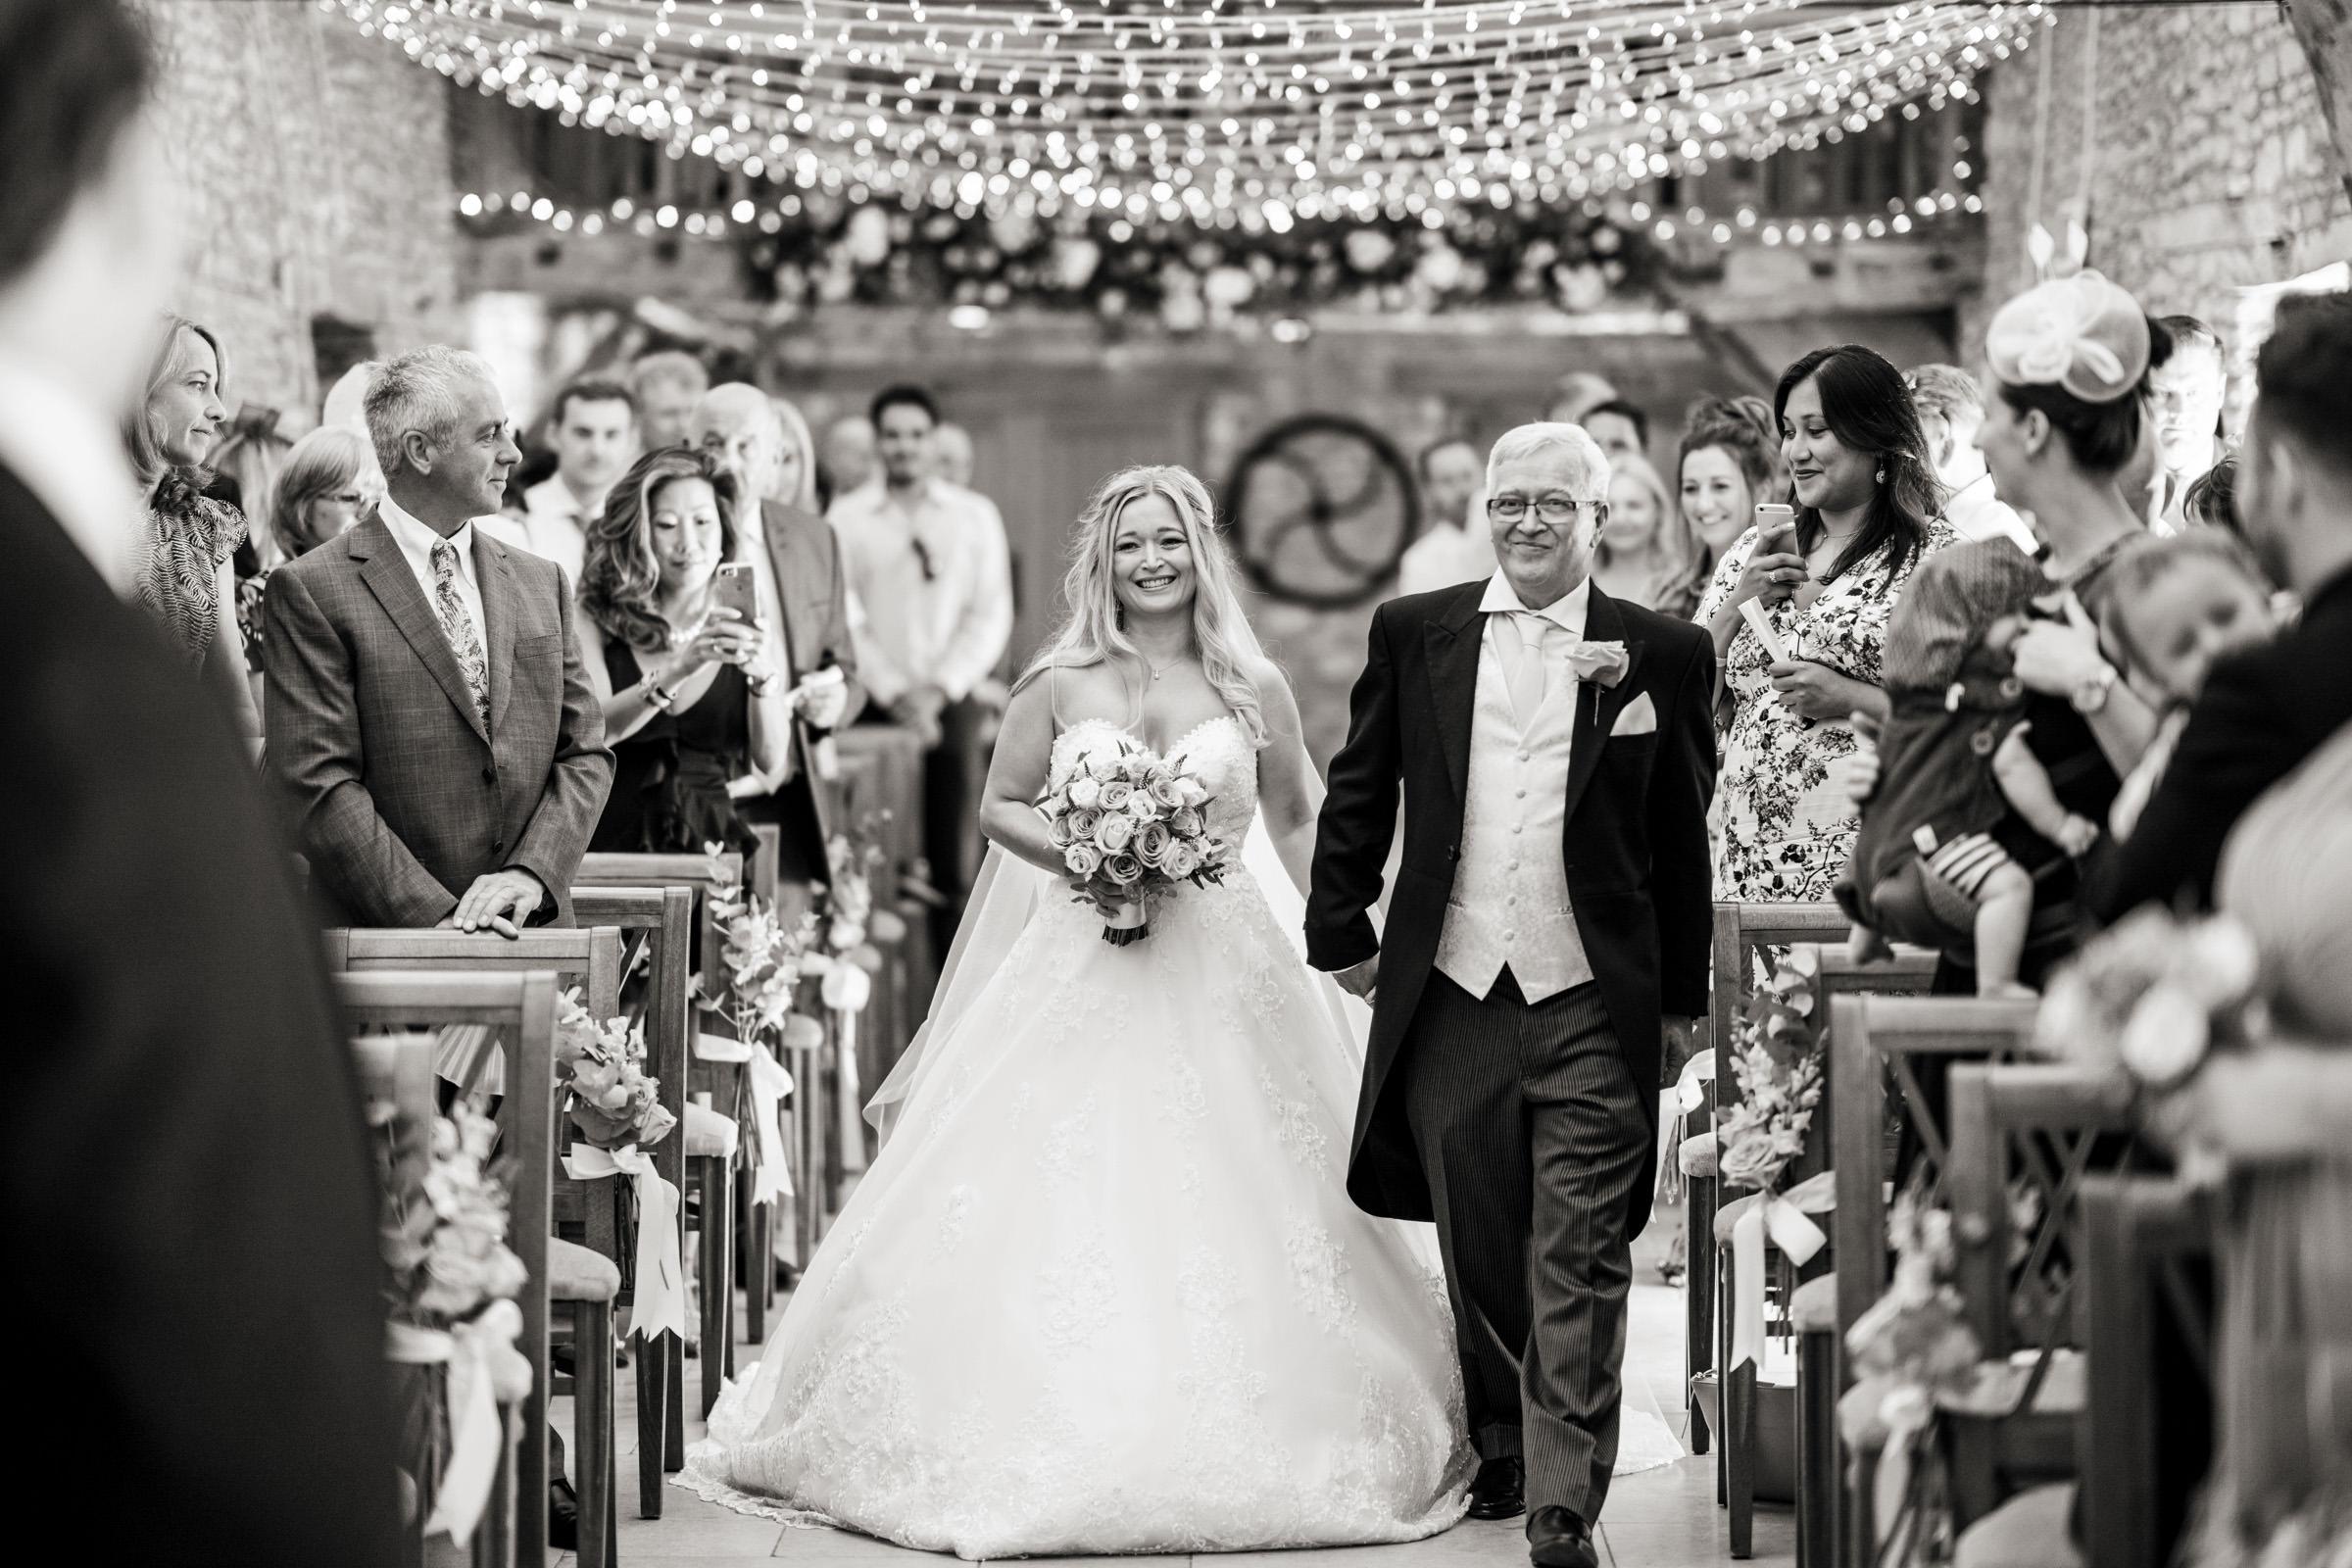 Caswell House Wedding Photography 012.jpg